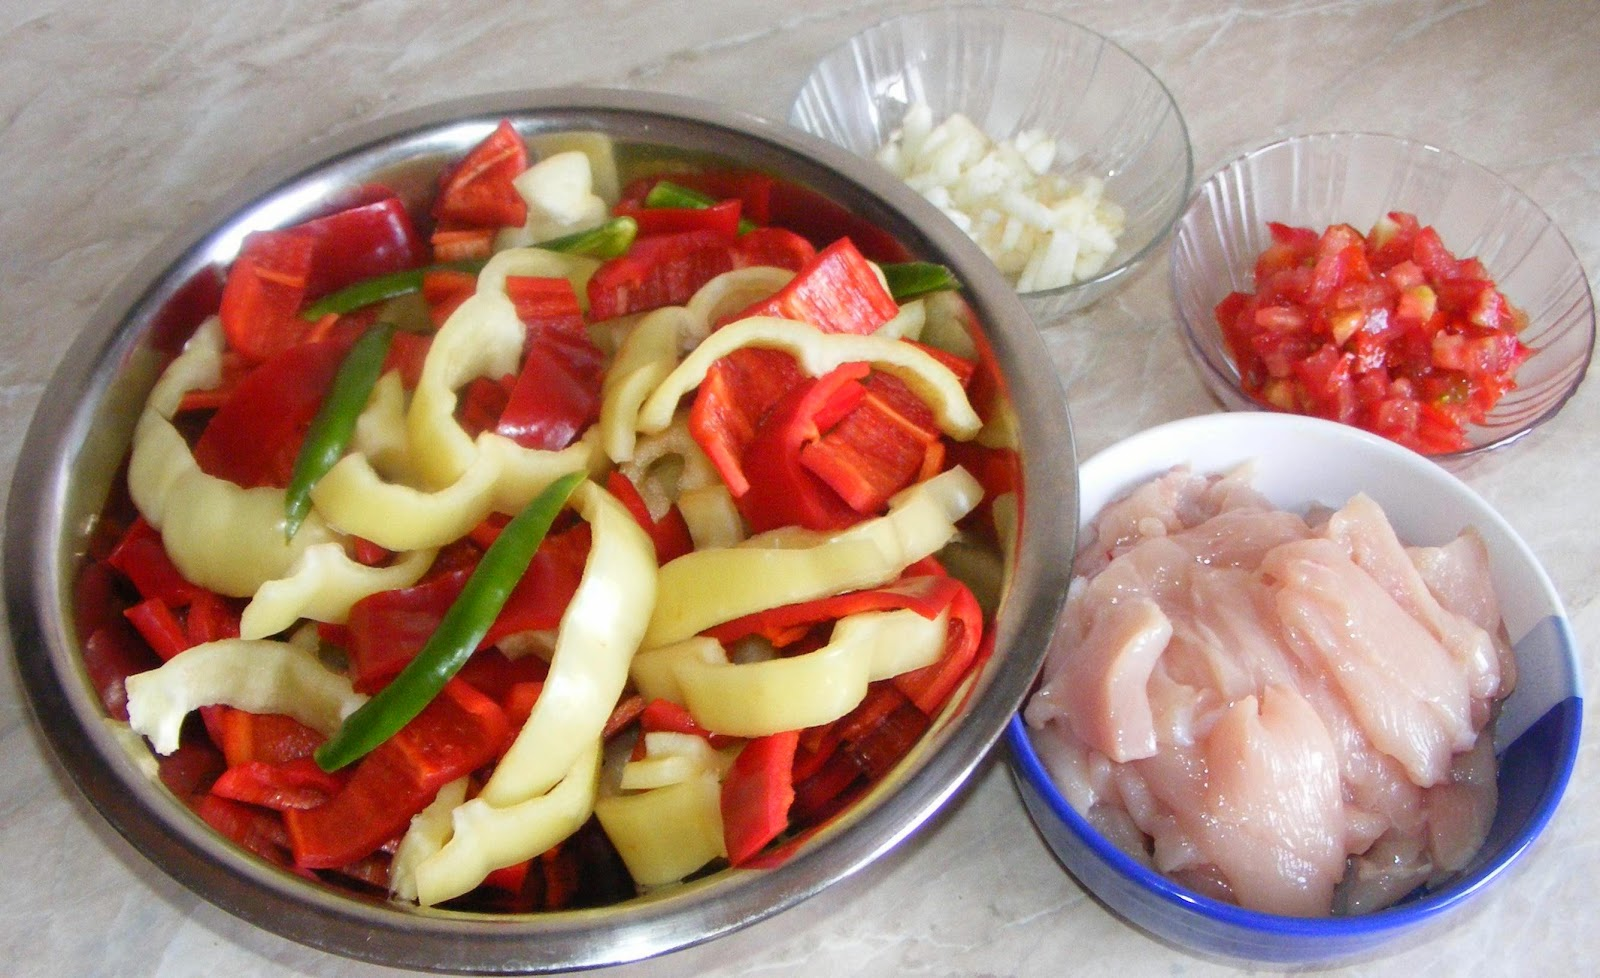 ingrediente piept de pui cu ardei si susan , ingrediente pui cu susan, cum se prepara pui cu susan, cum se prepara piept de pui cu ardei si susan, retete de mancare, retete rapide, retete simple, retete chinezesti, retete asiatice, retete straine,